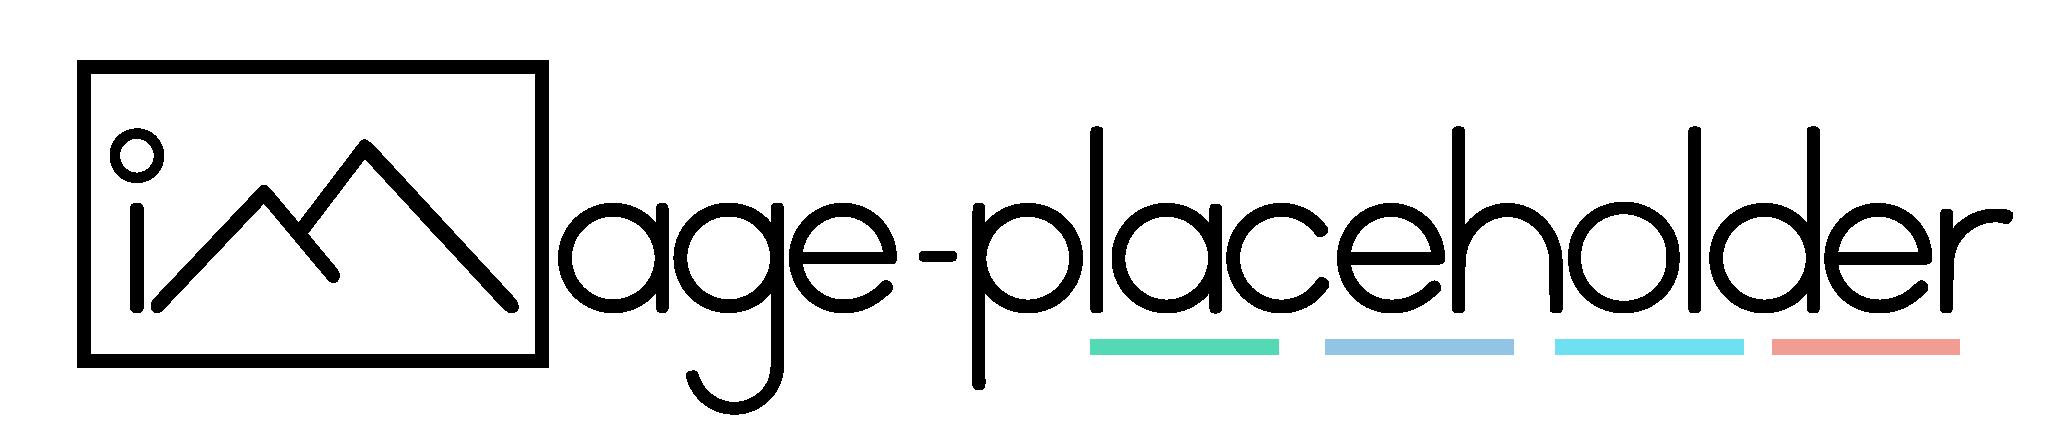 Image Placeholder Logo